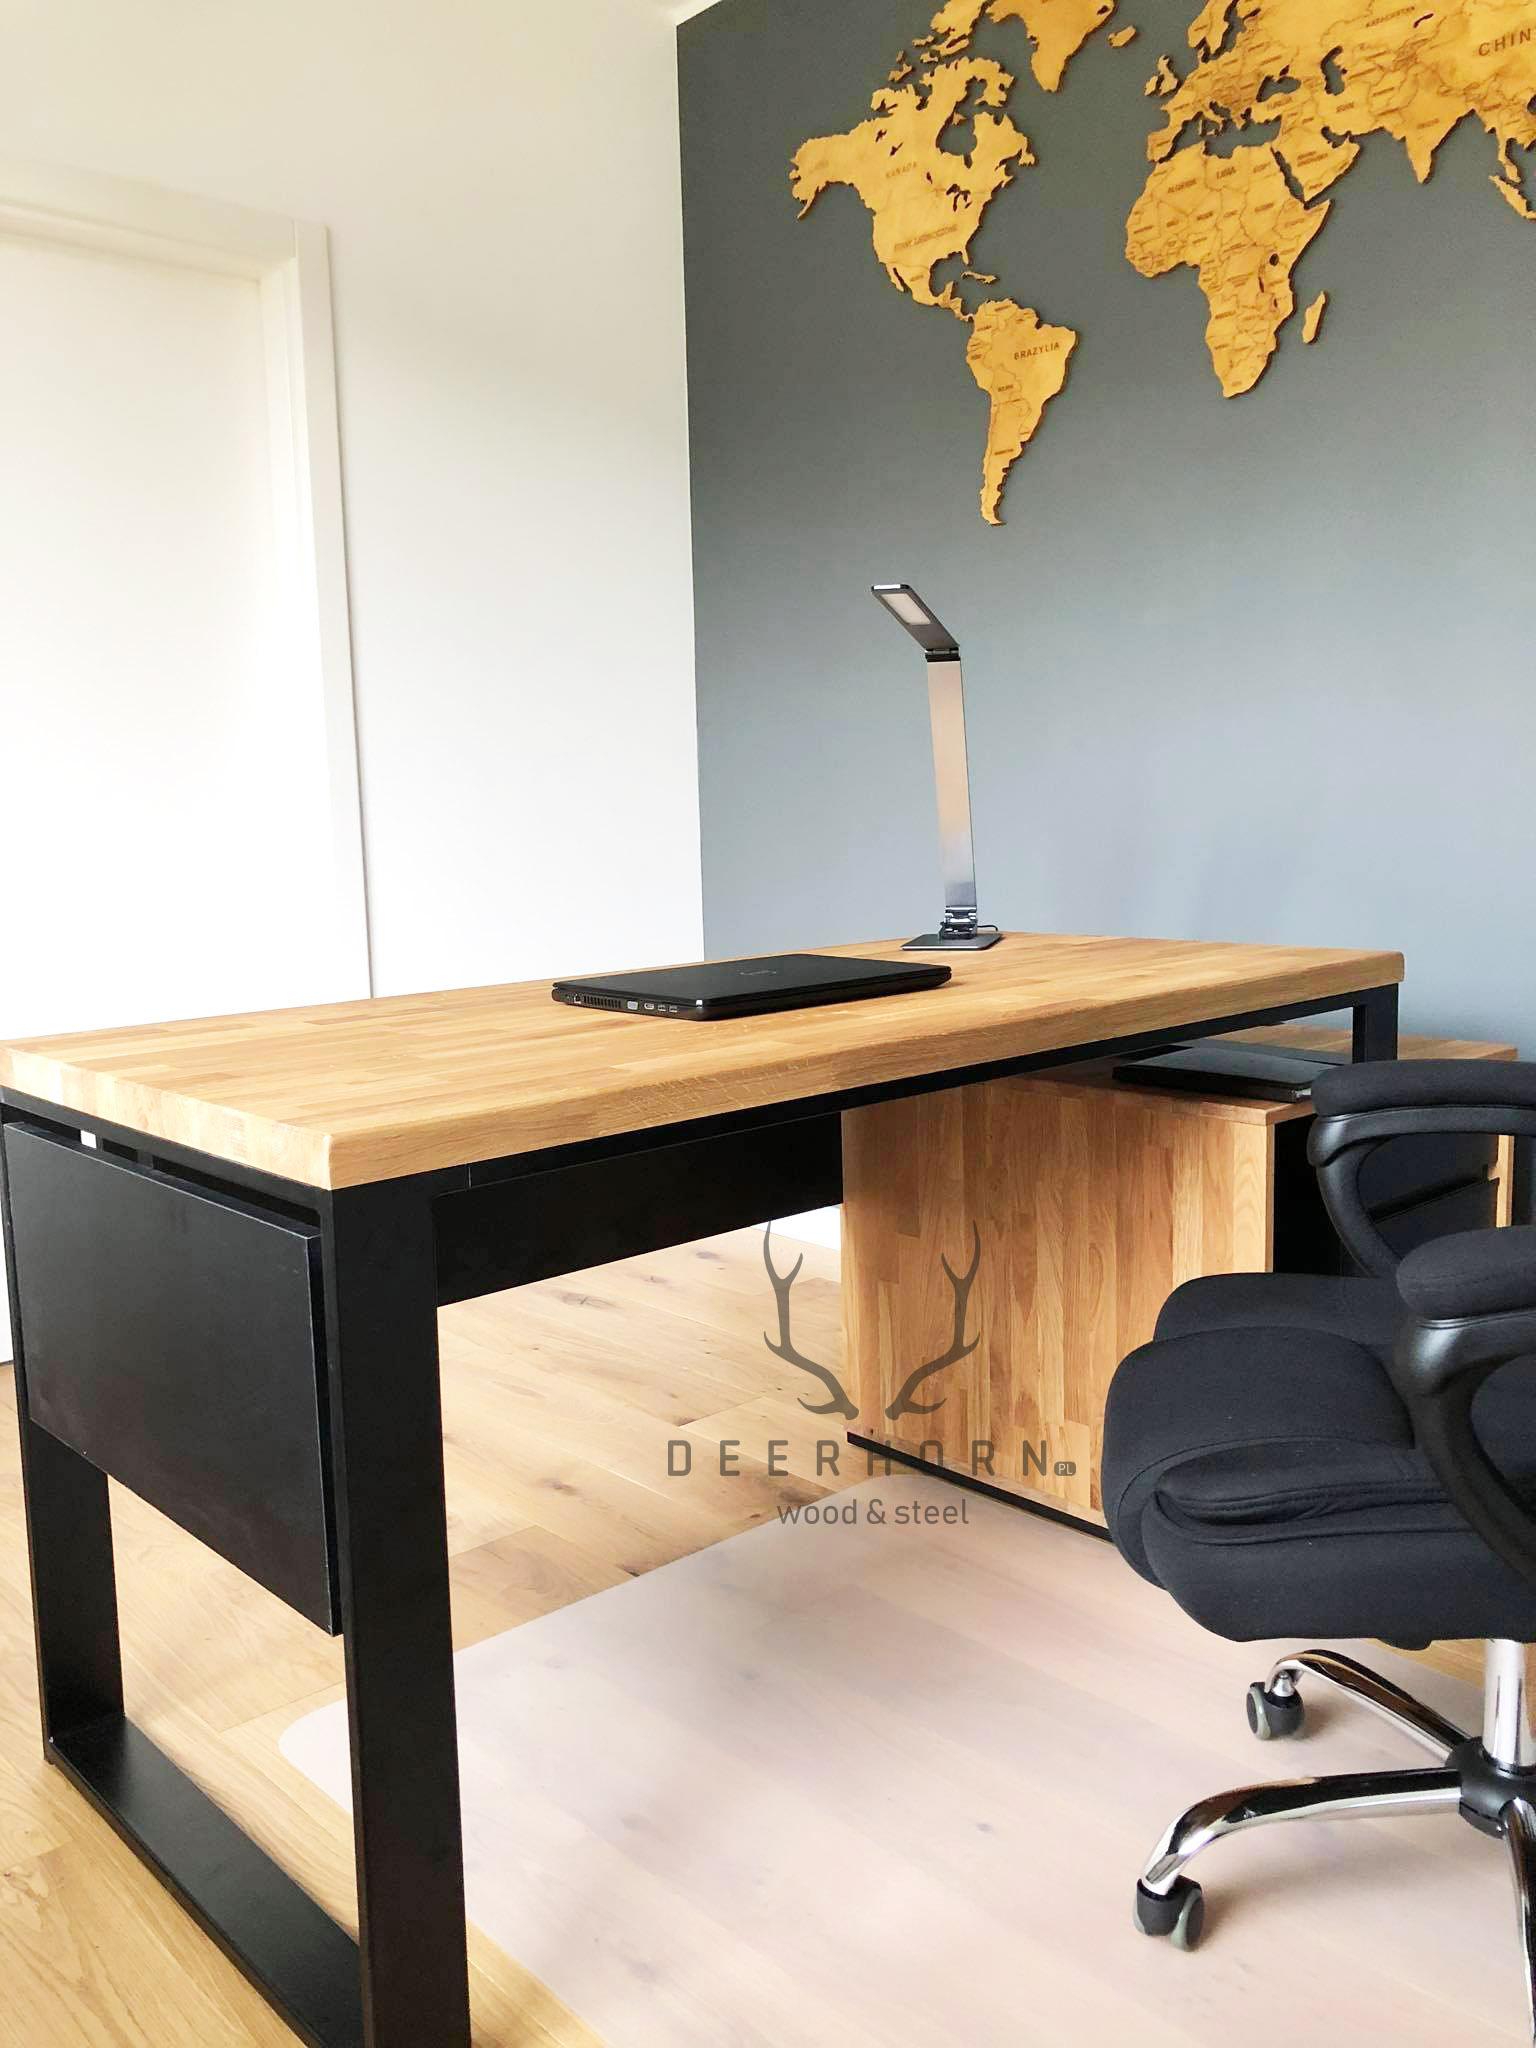 Modne biurko z drewnianym blatem office plus   Deerhorn meble